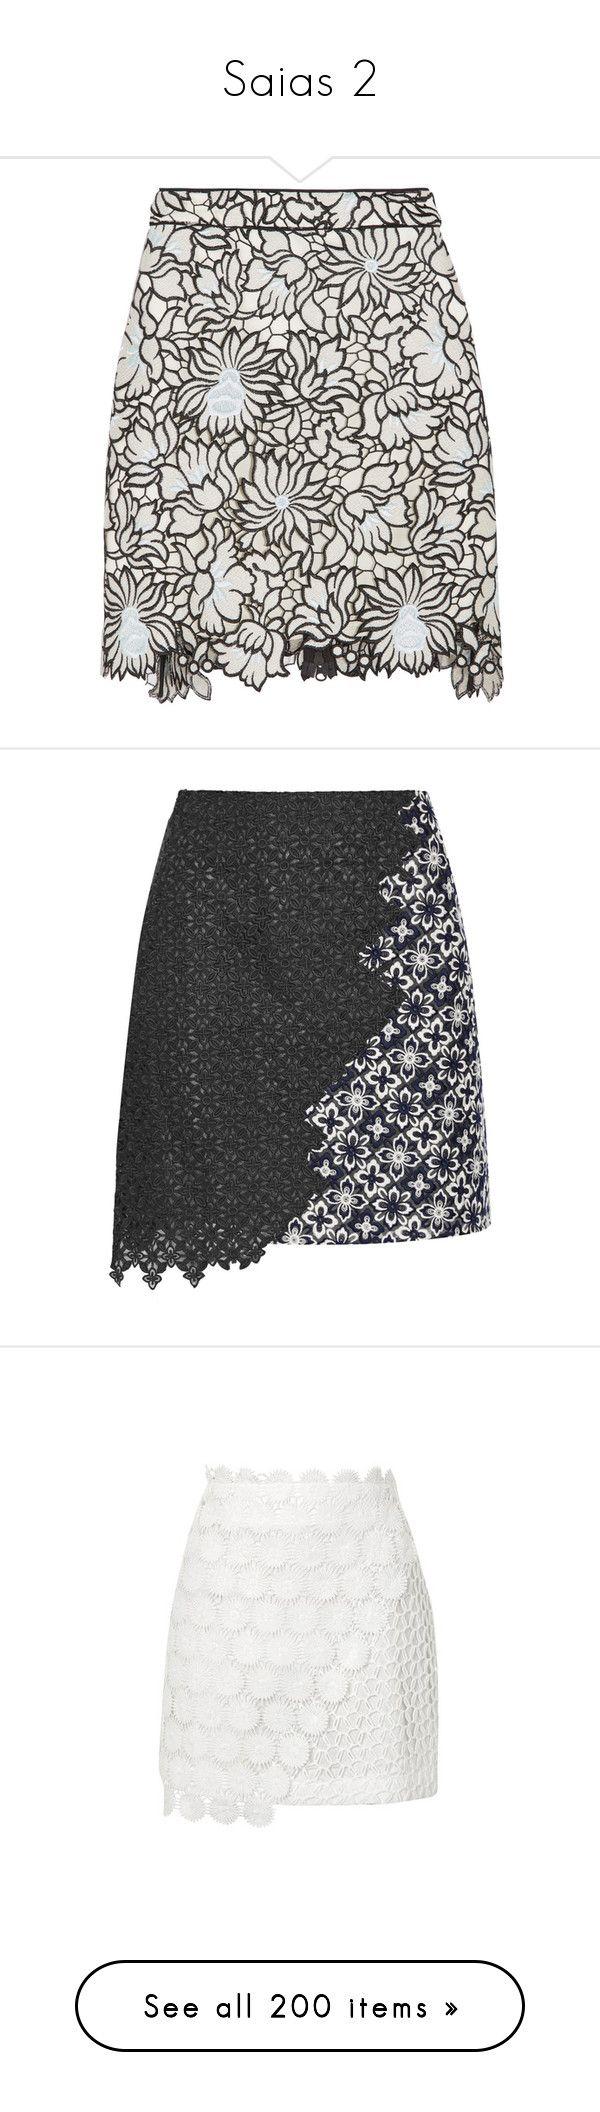 """Saias 2"" by marymariamary ❤ liked on Polyvore featuring skirts, mini skirts, sky blue, zipper mini skirt, sky blue skirt, lace skirts, zip skirt, lace mini skirt, charcoal and asymmetrical mini skirt"